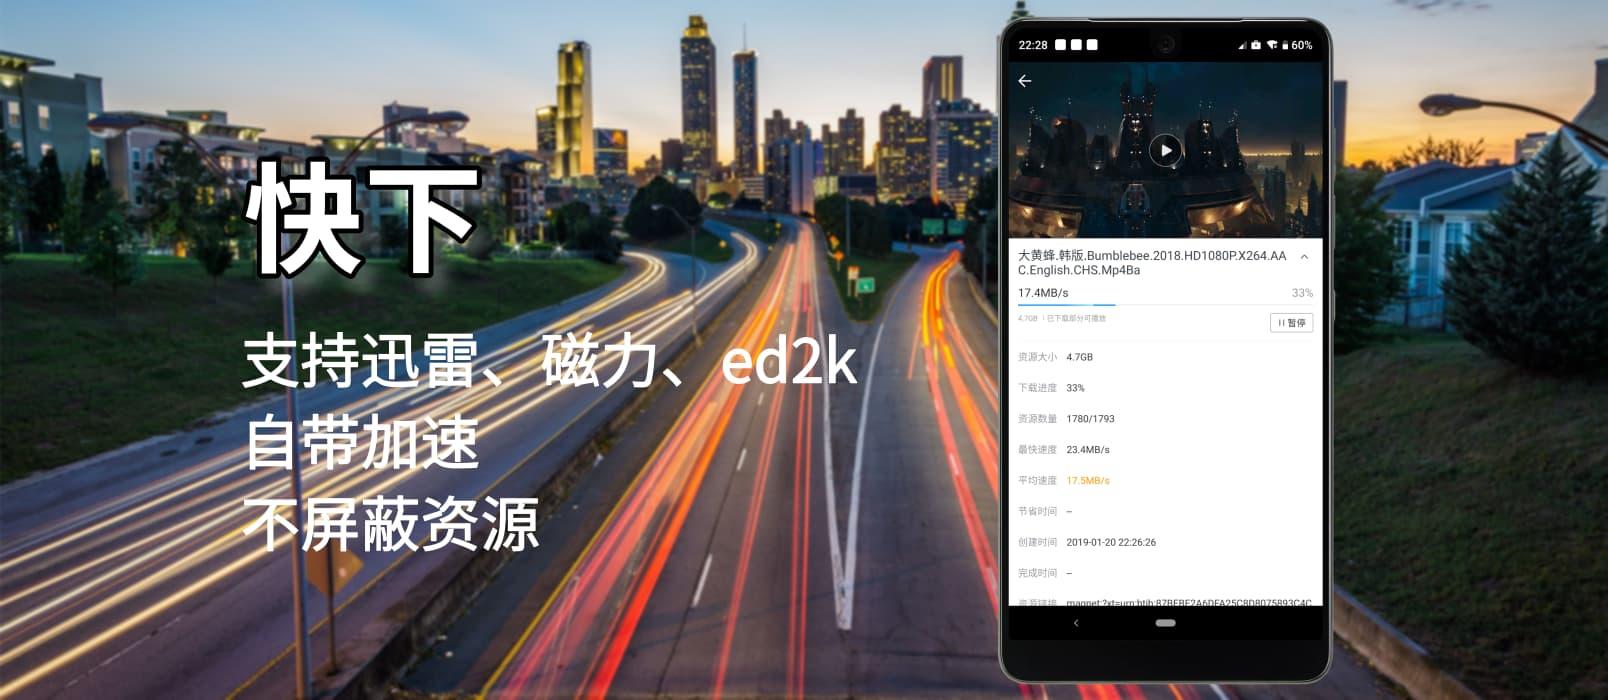 快下 – 可替代迅雷的 Android 下载工具第1张-菜鸟分享